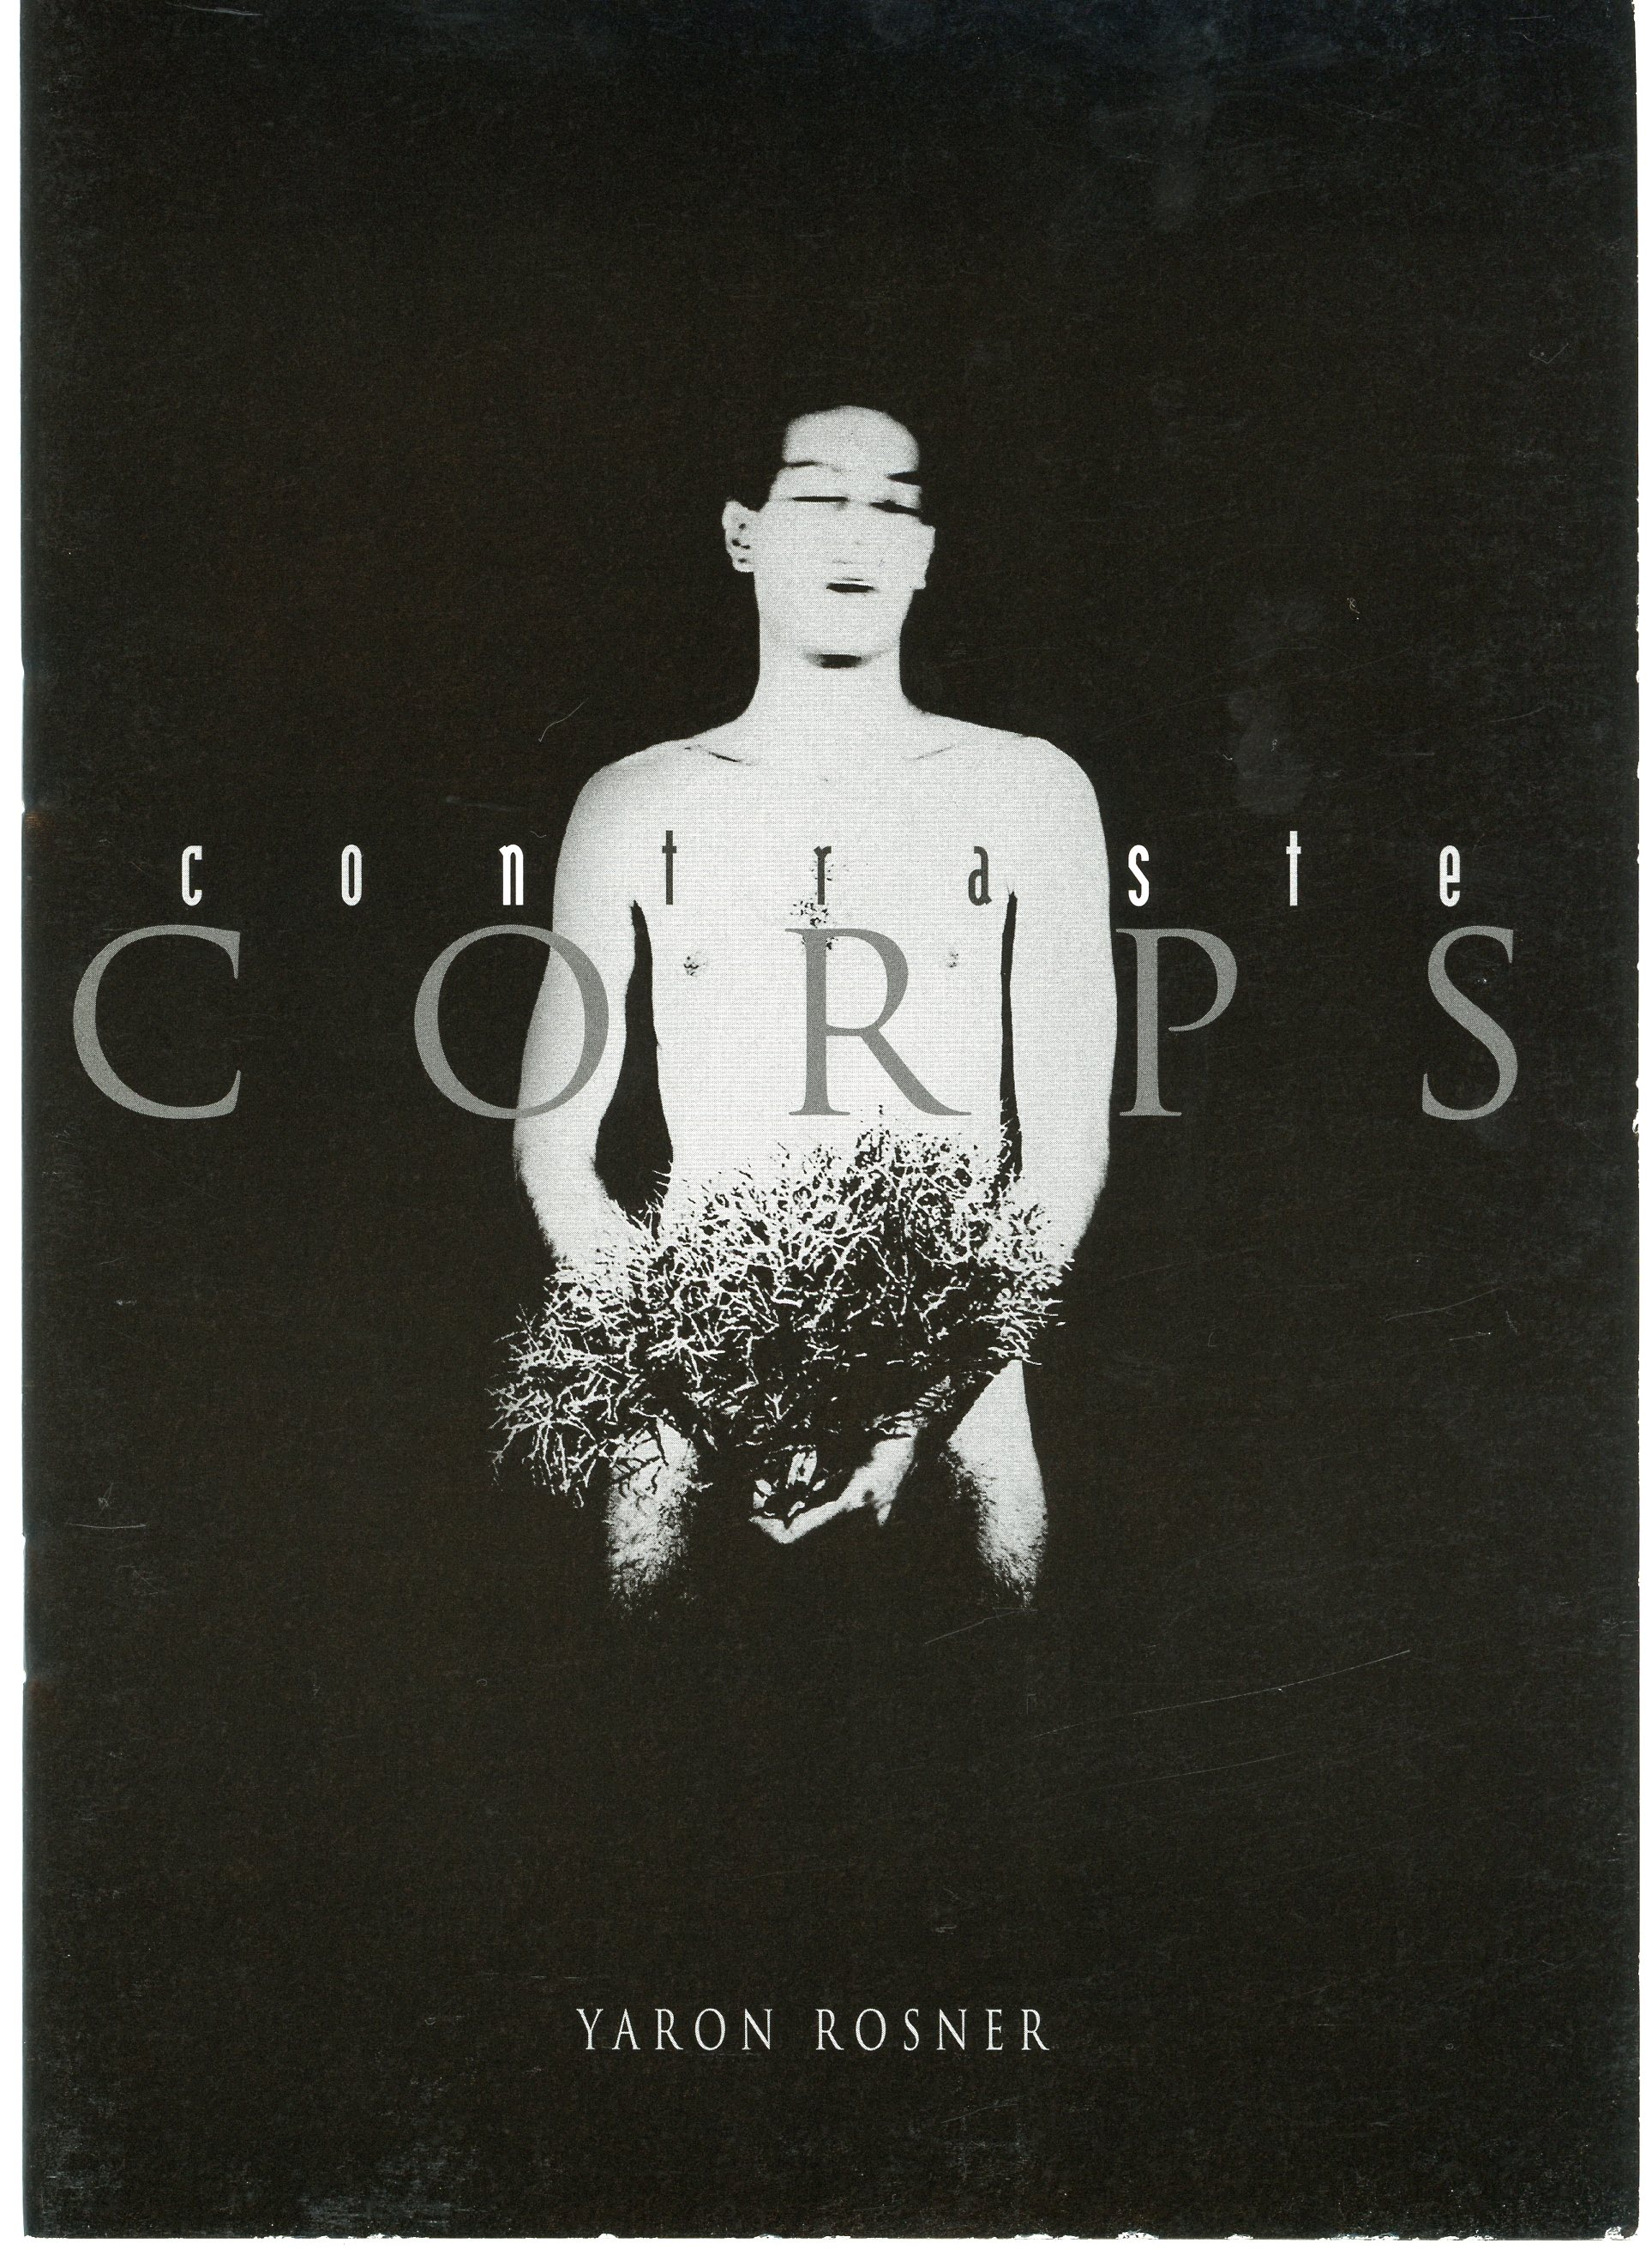 C.C catalog062.jpg